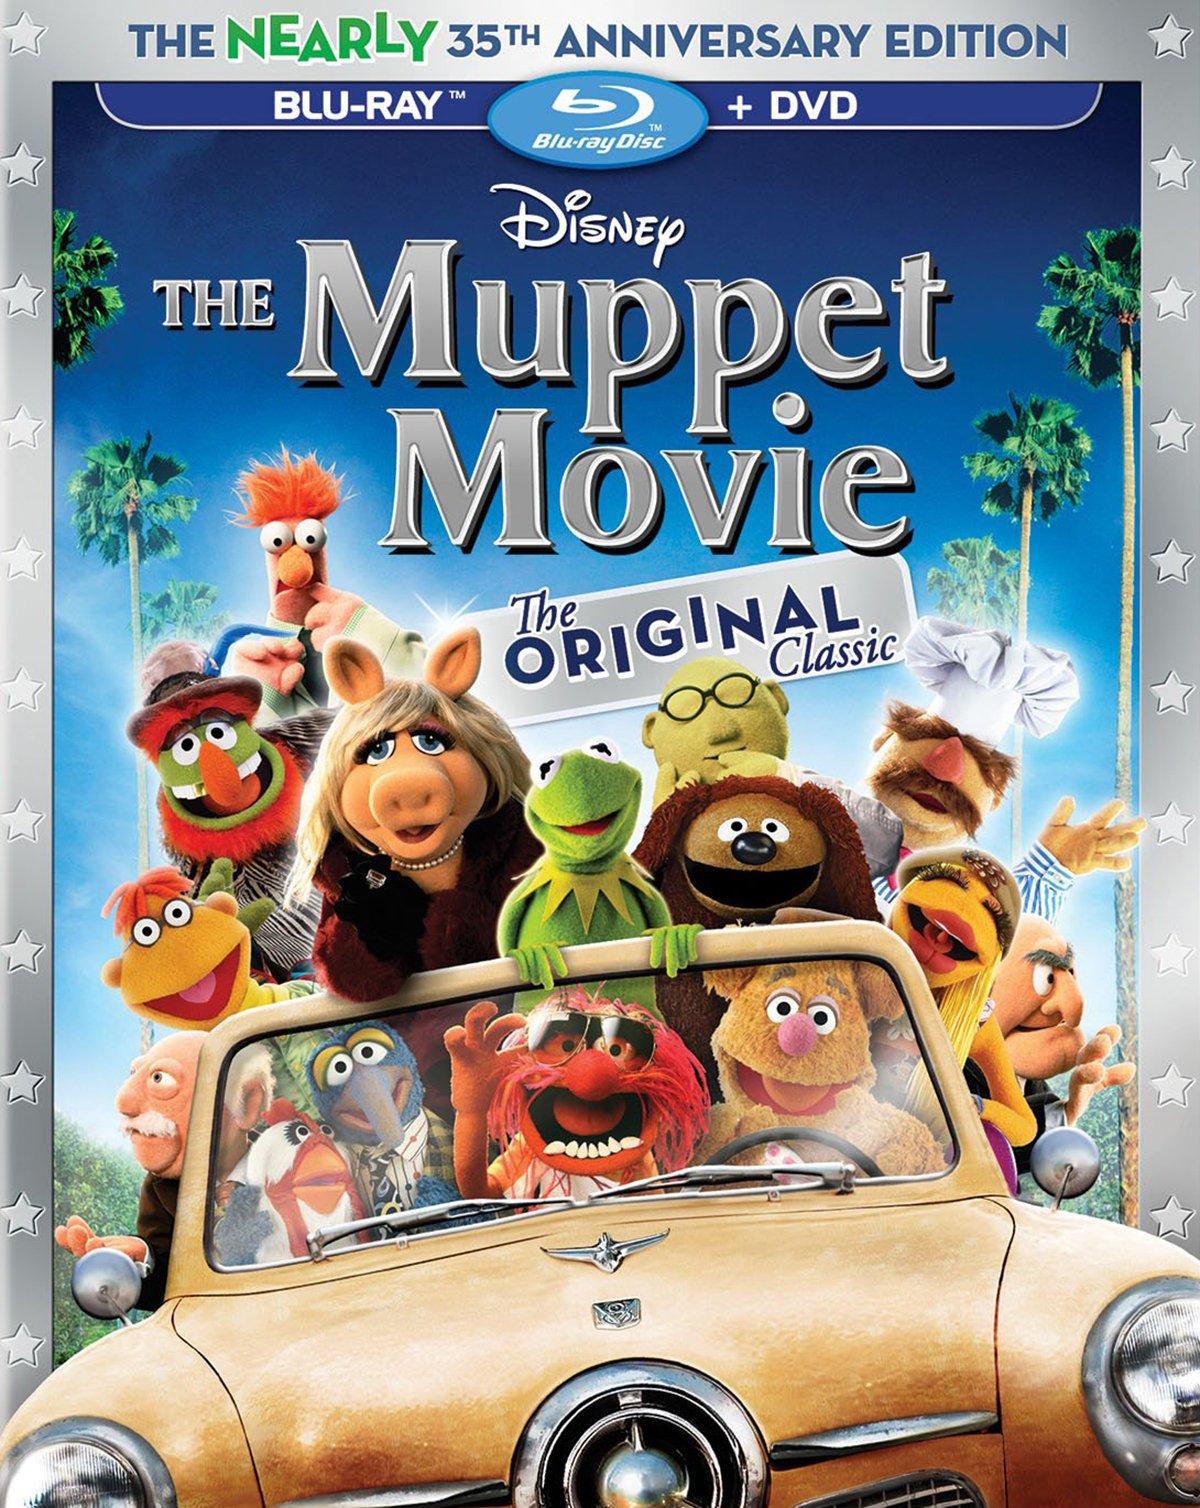 Blu-ray Review: The Muppet Movie - Slant Magazine